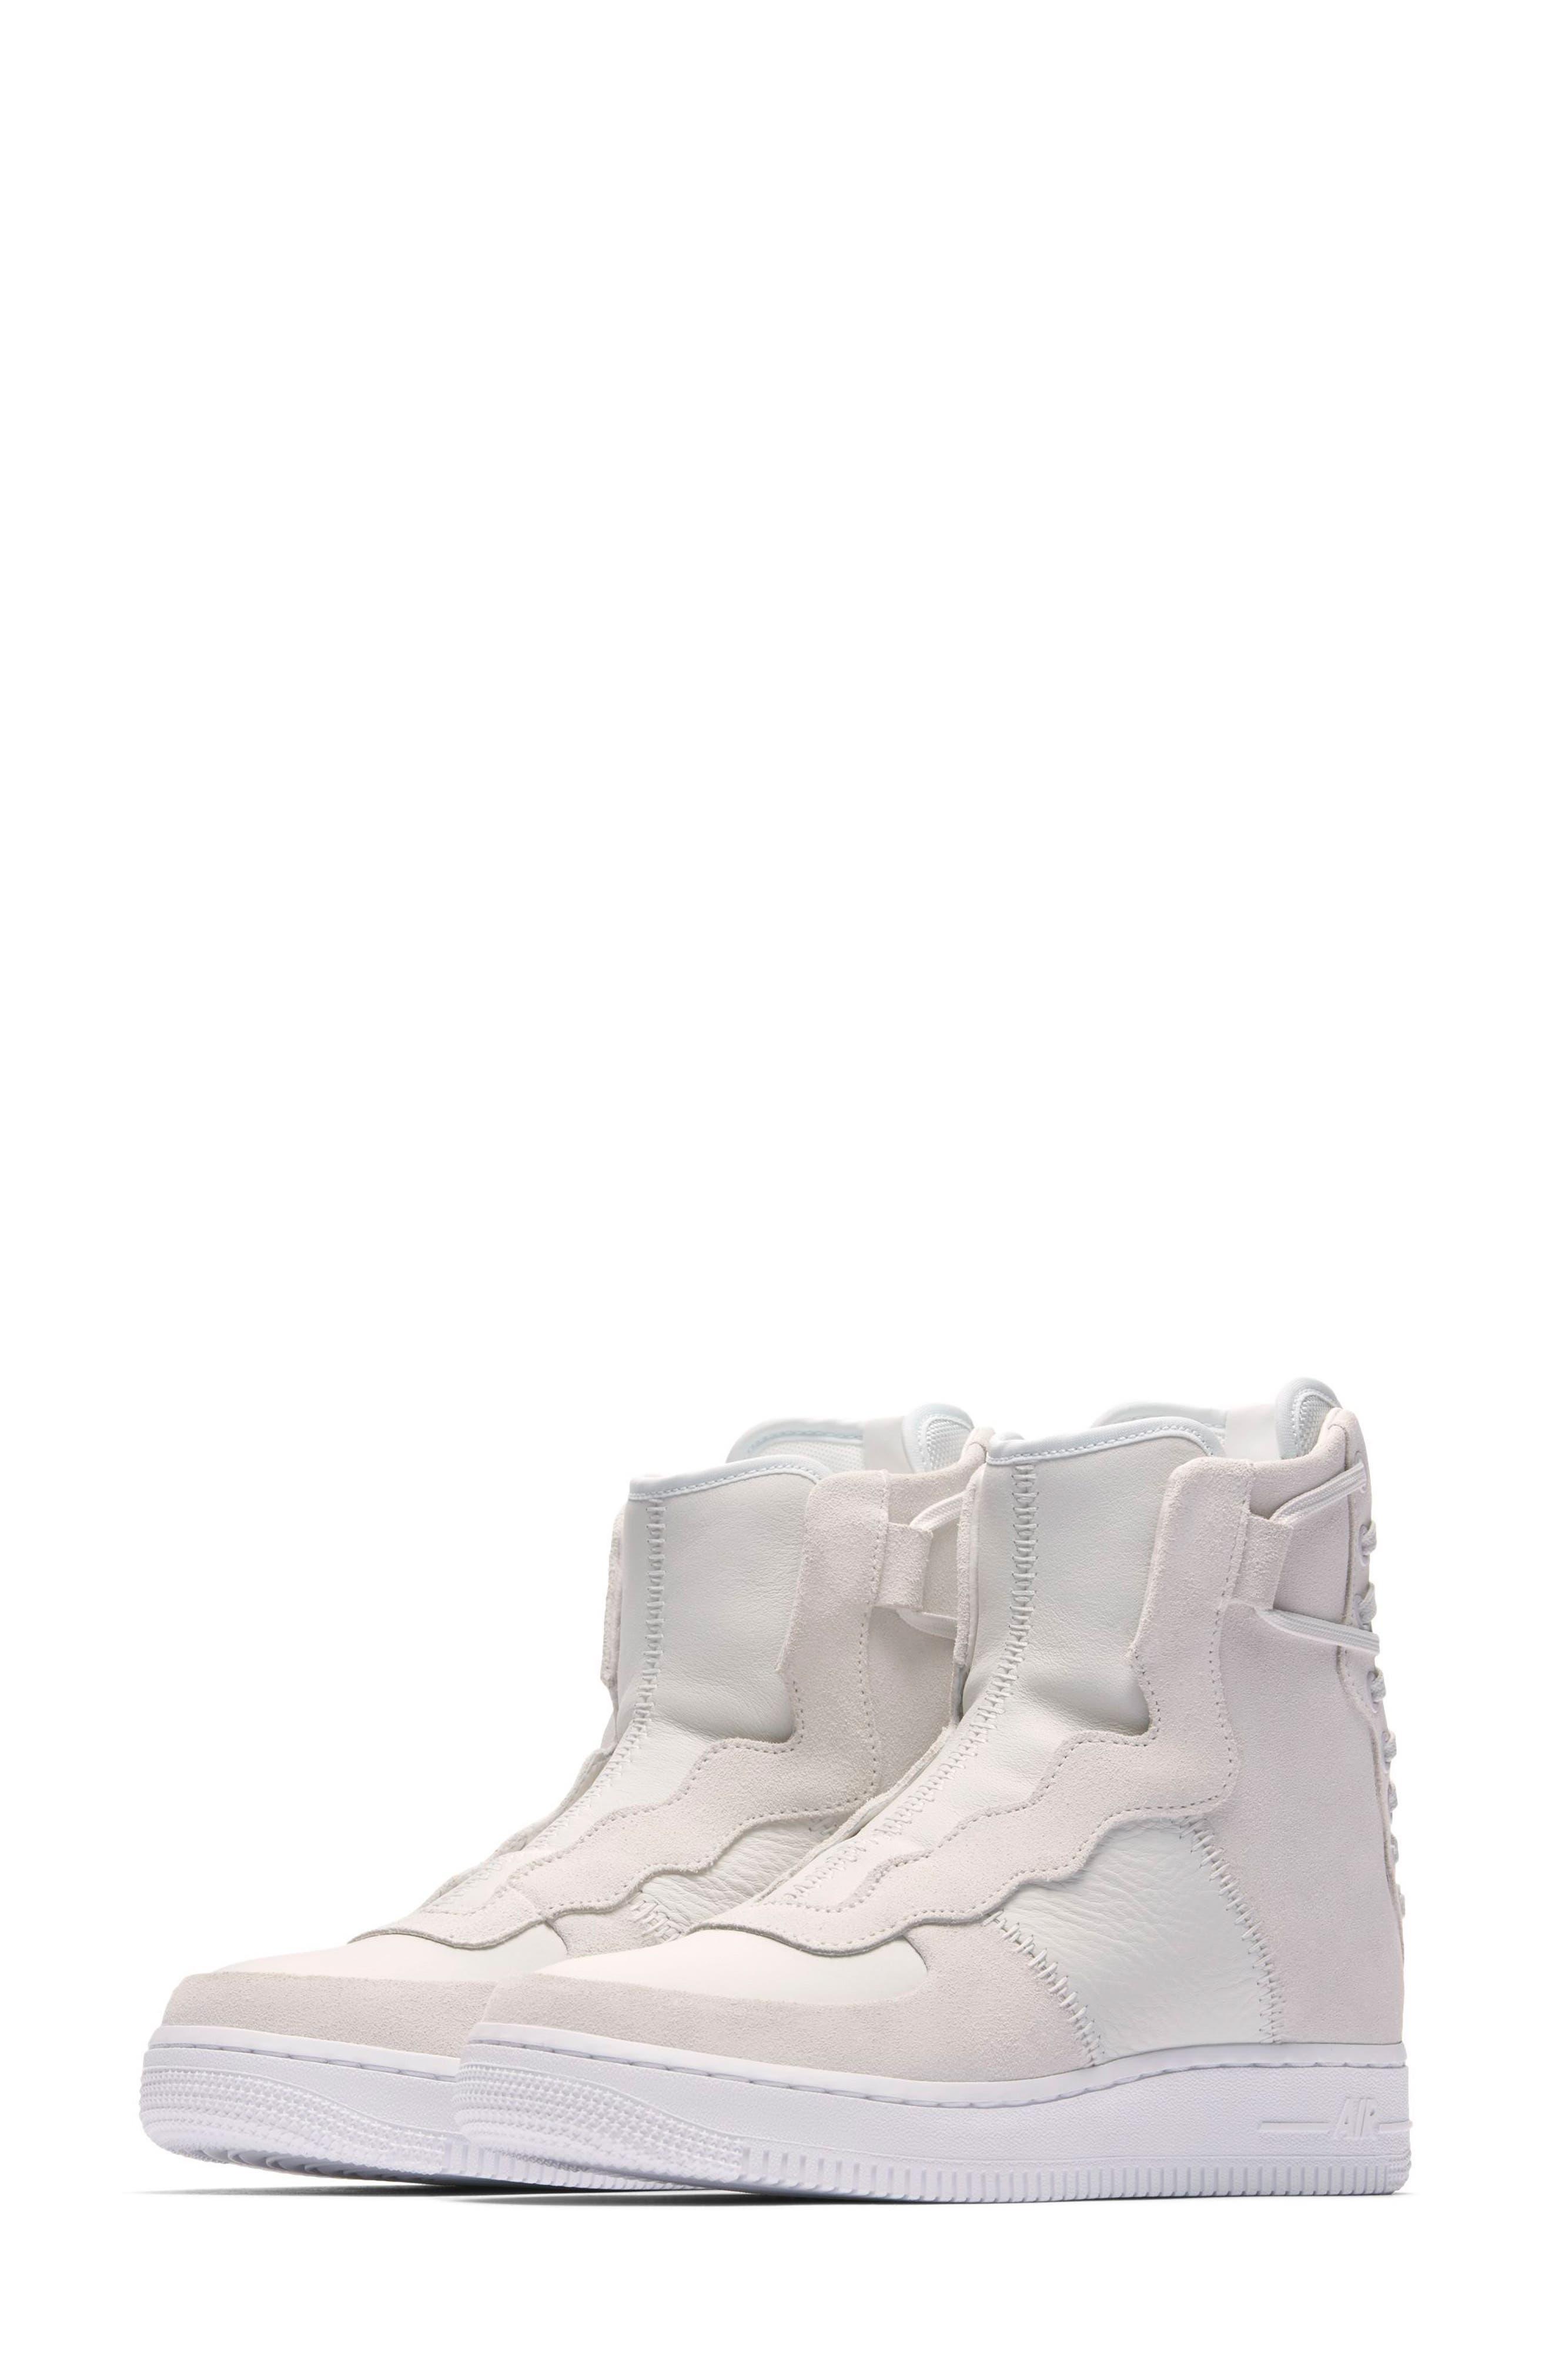 Nike Air Force 1 Rebel XX High Top Sneaker (Women)